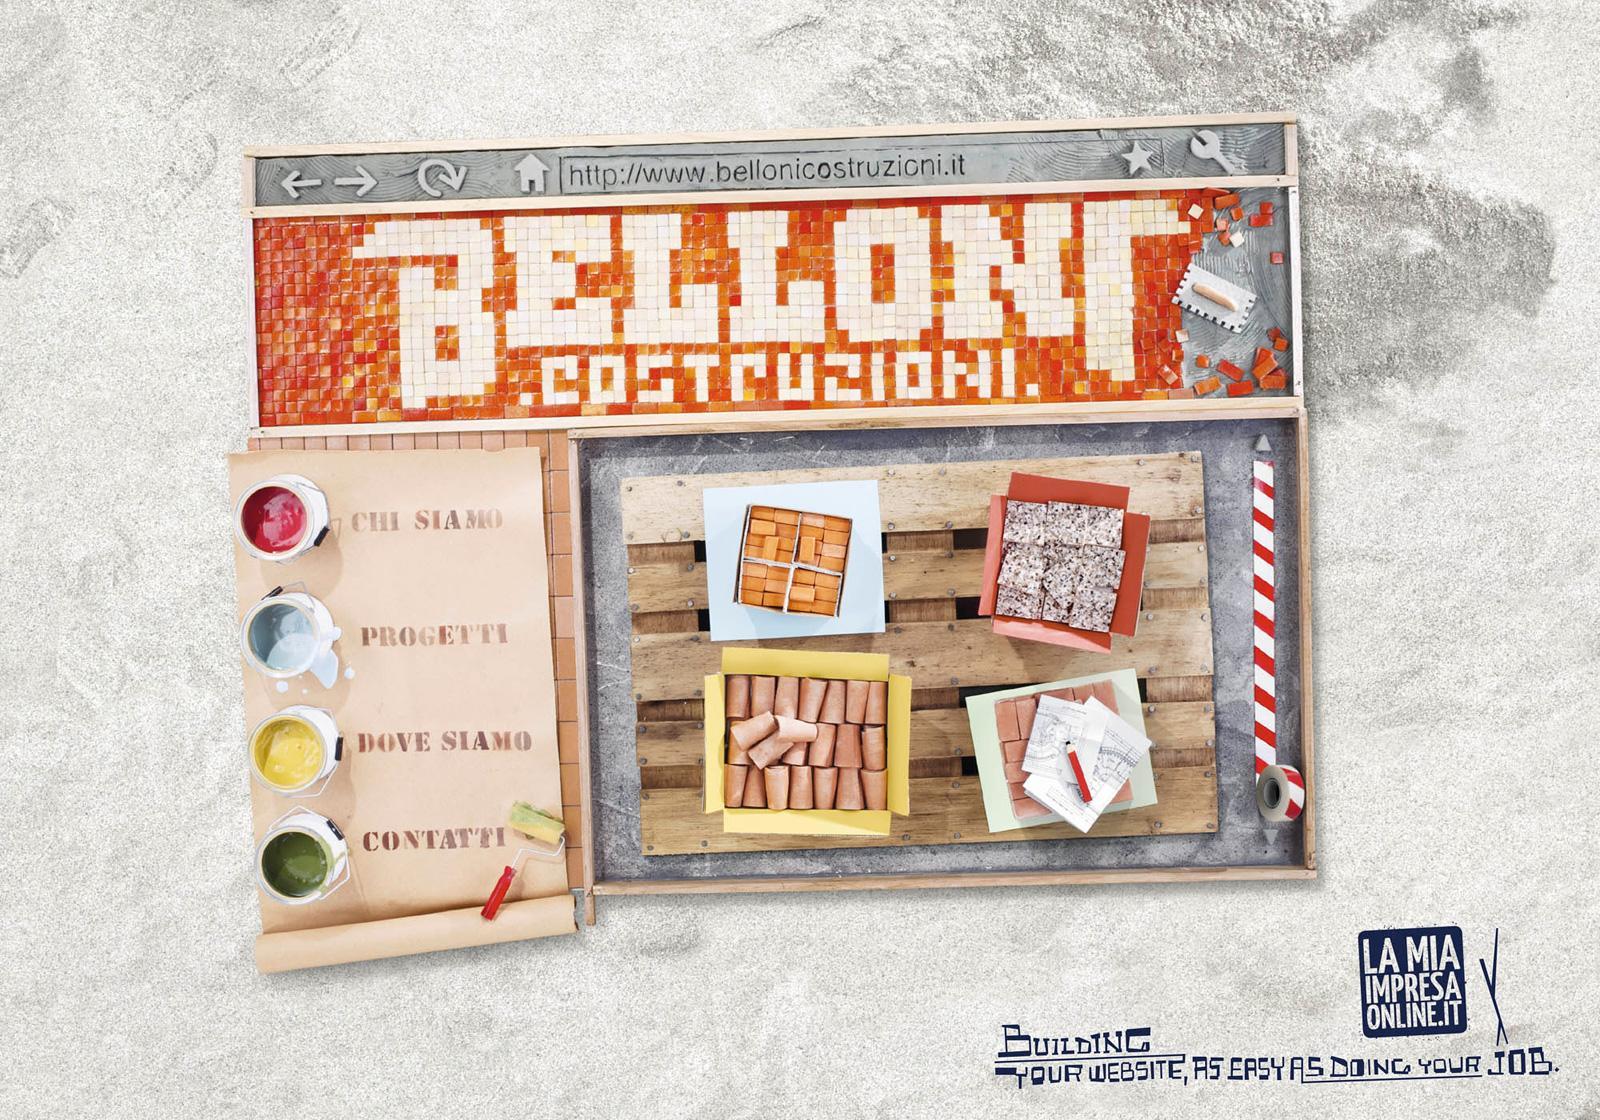 LaMiaImpresaOnline Print Ad -  Building your Web Business, Belloni Costruzioni